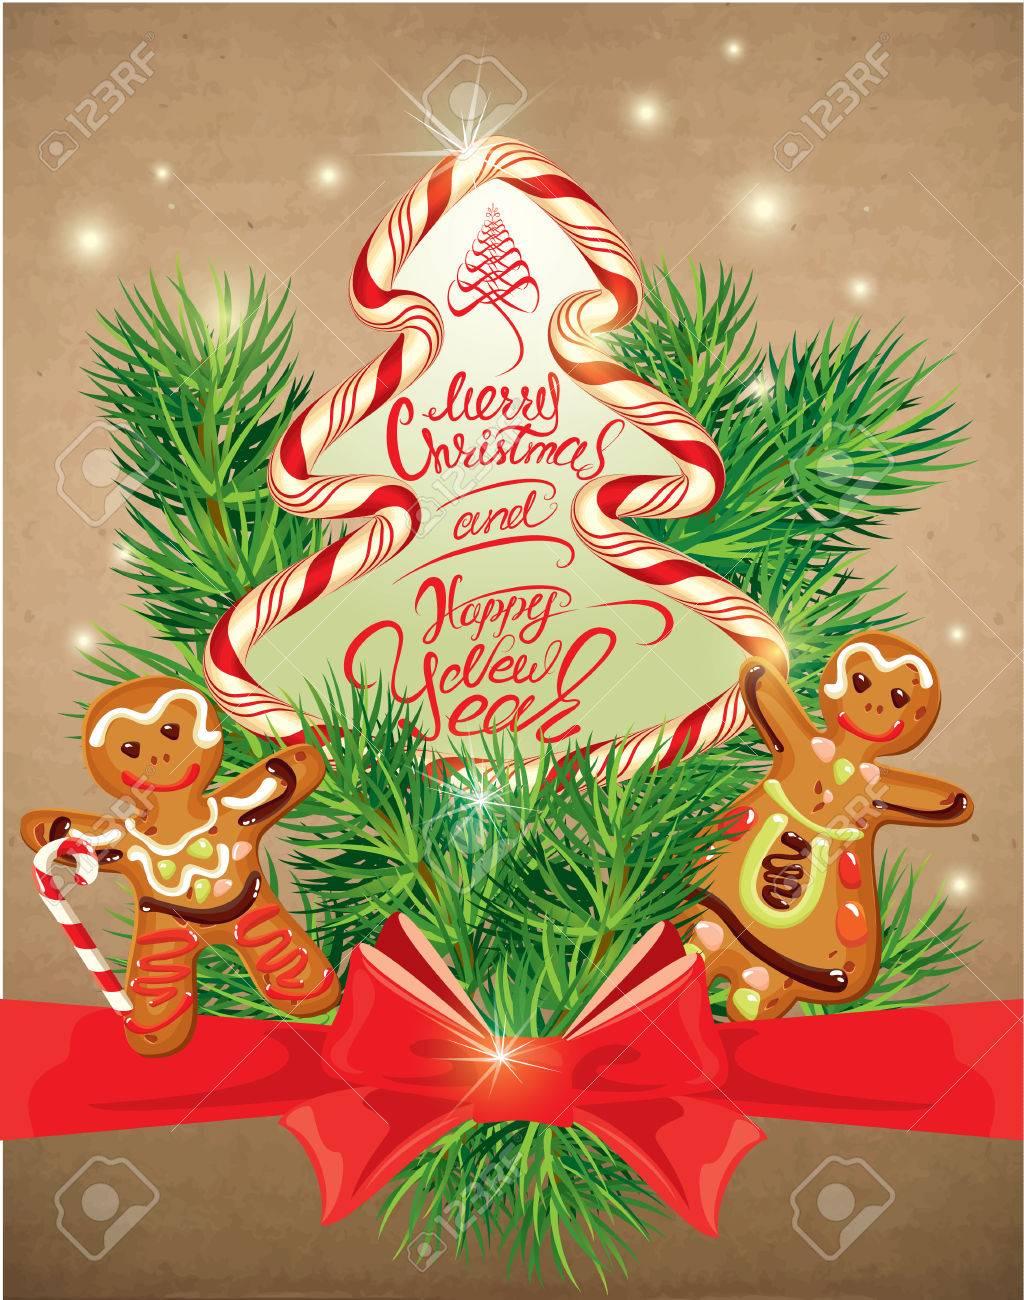 Holiday Greeting Card With Xmas Gingerbread - Man And Woman Cartoons ...